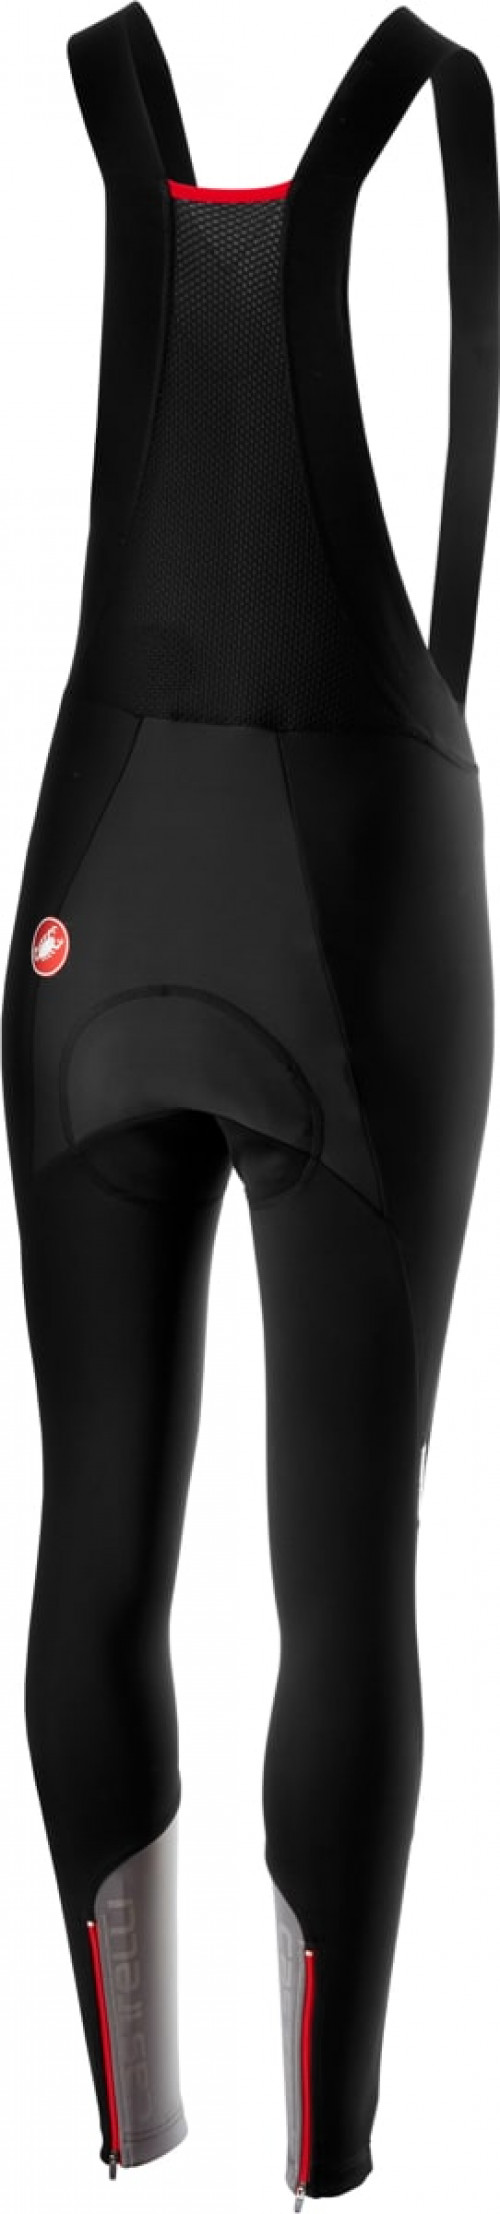 Castelli Nano Flex Pro 2 W Bibtight Black